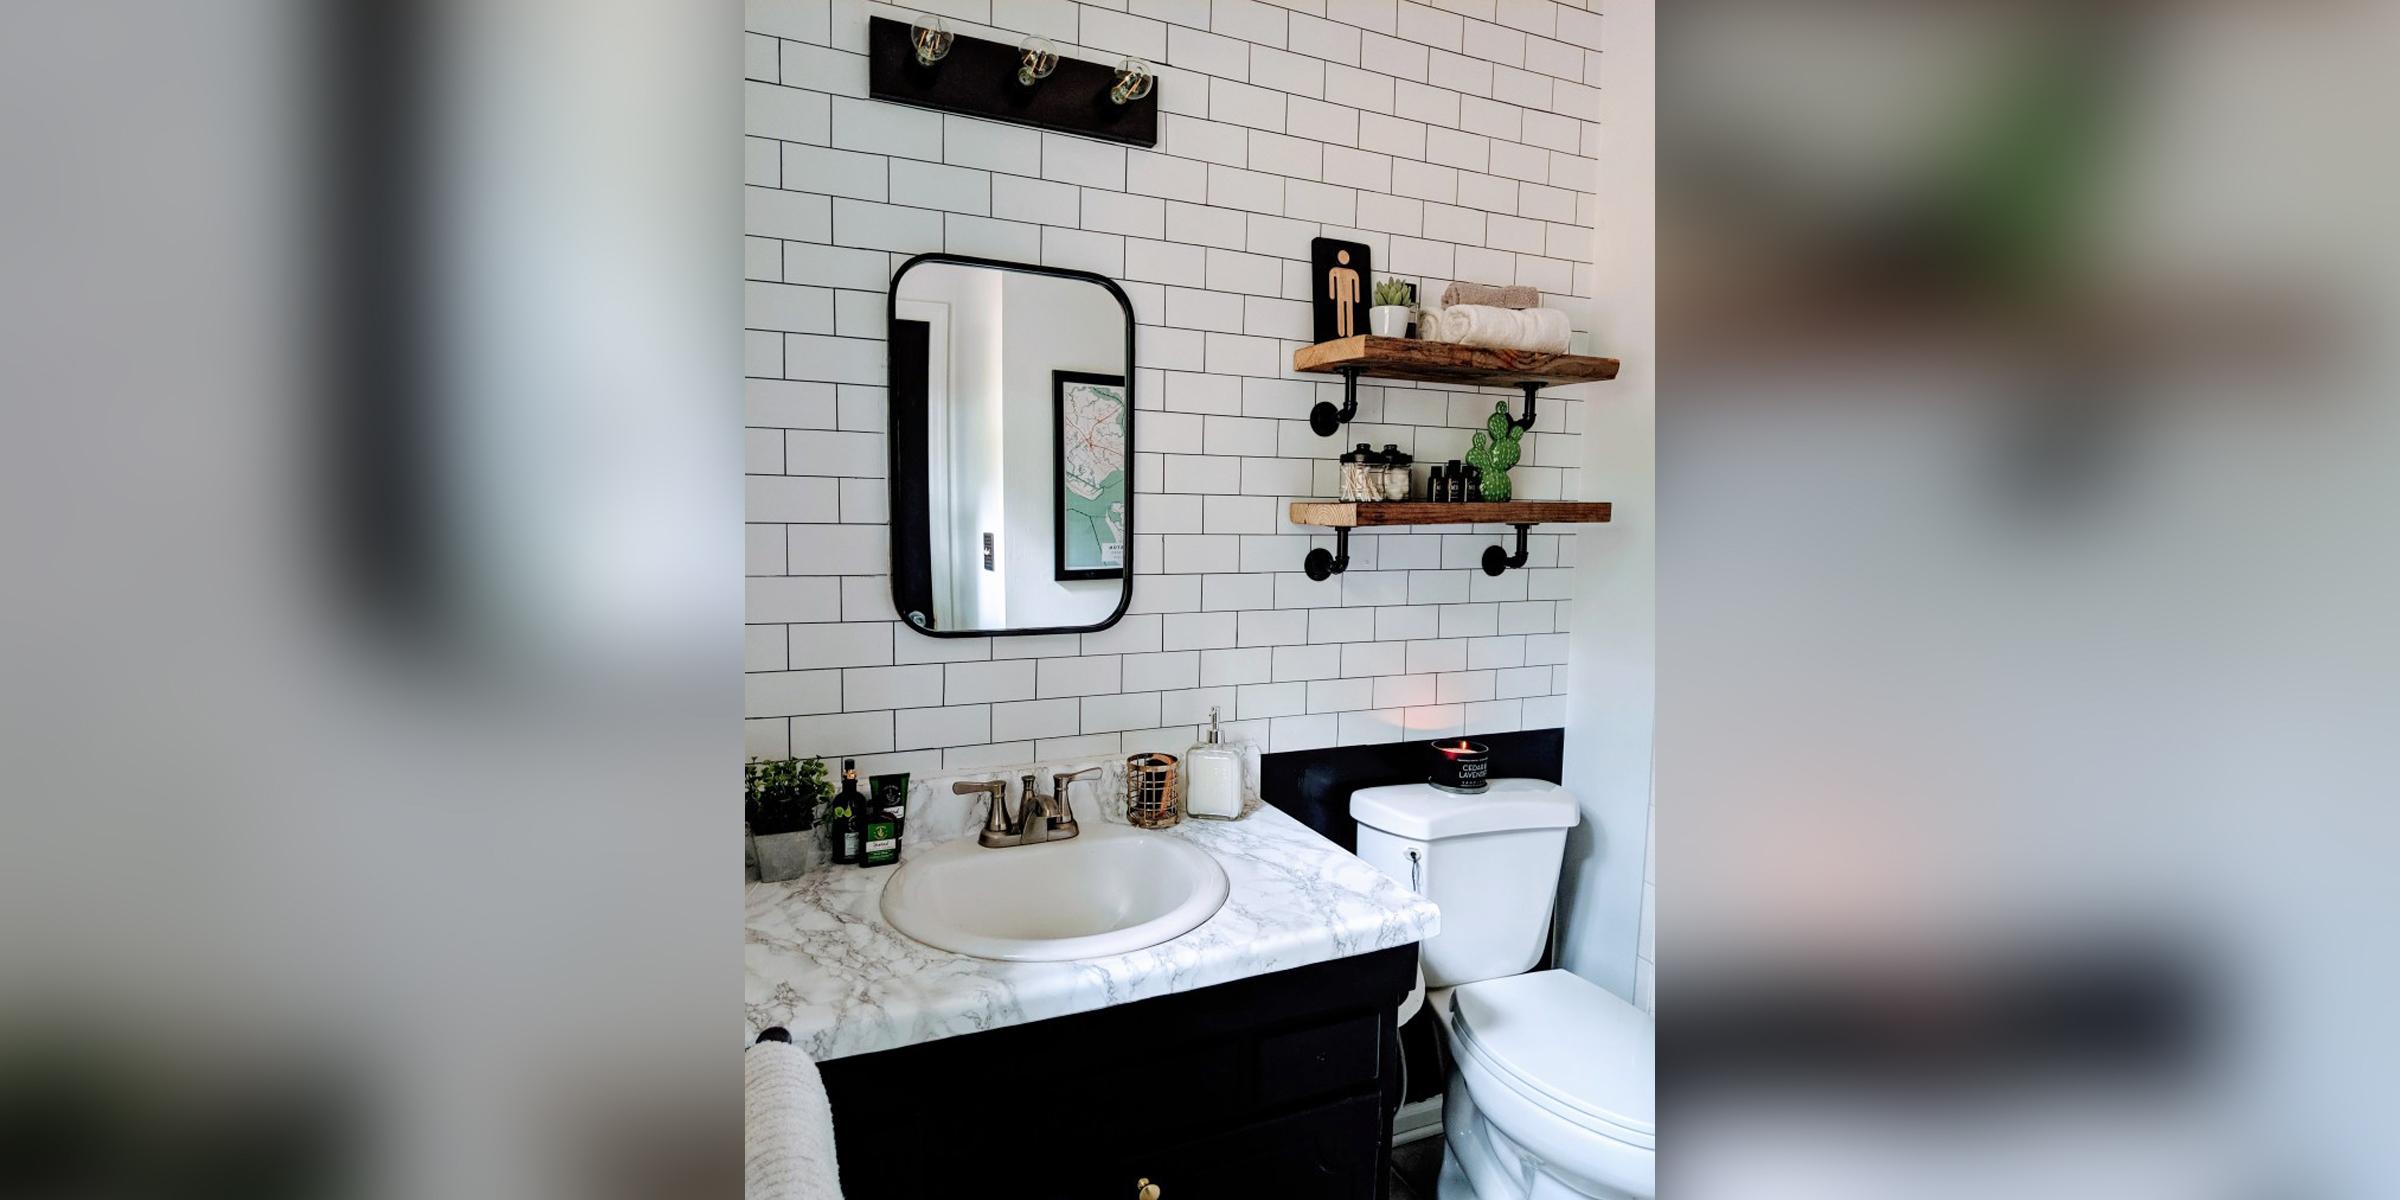 Subway Tile In Her Bathroom